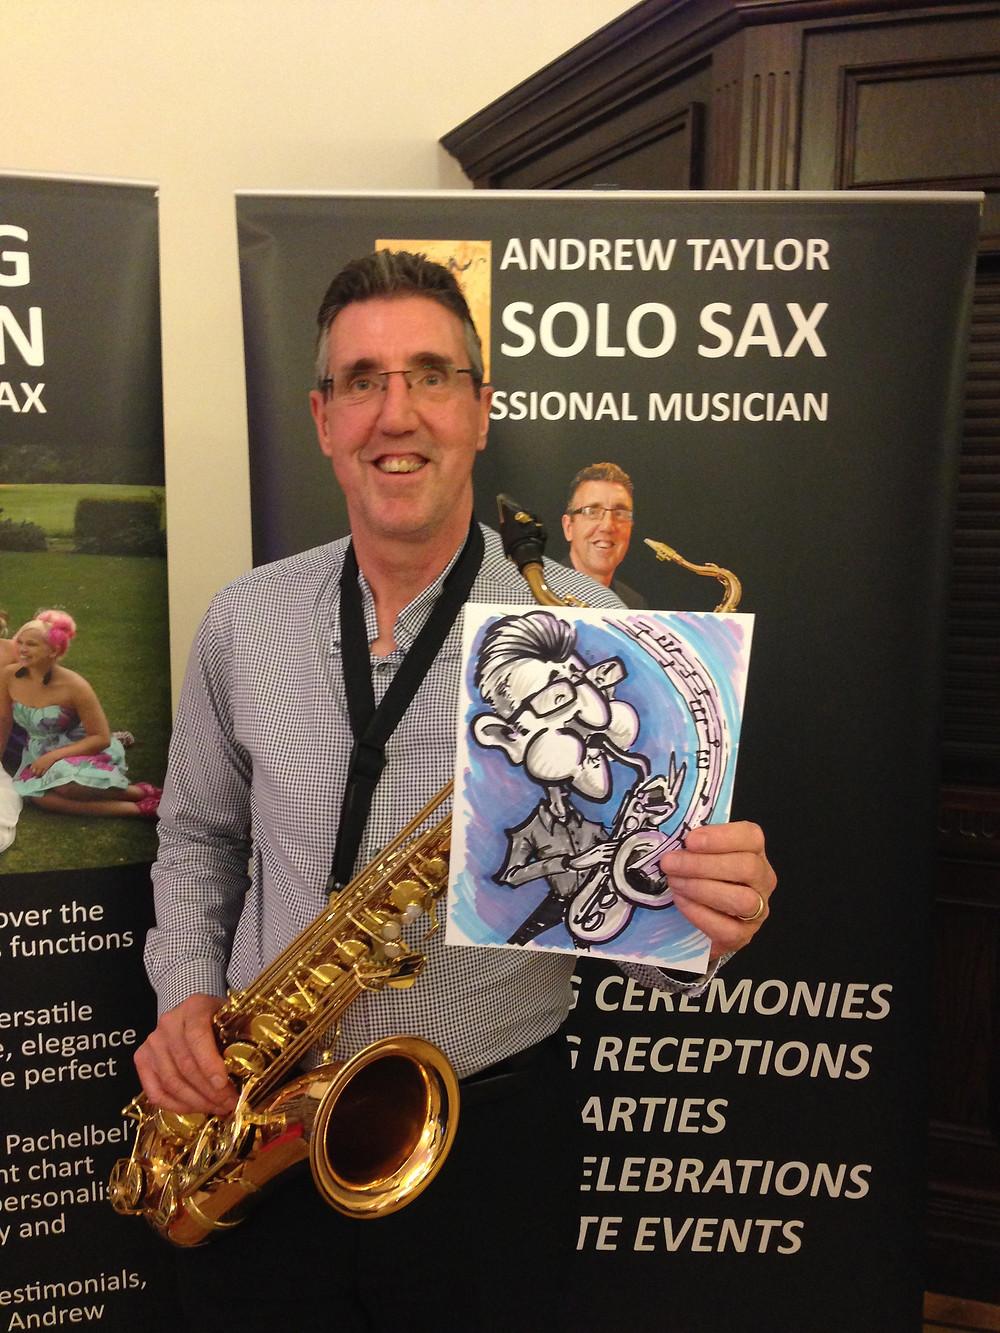 andrew taylor solo sax saxaphone